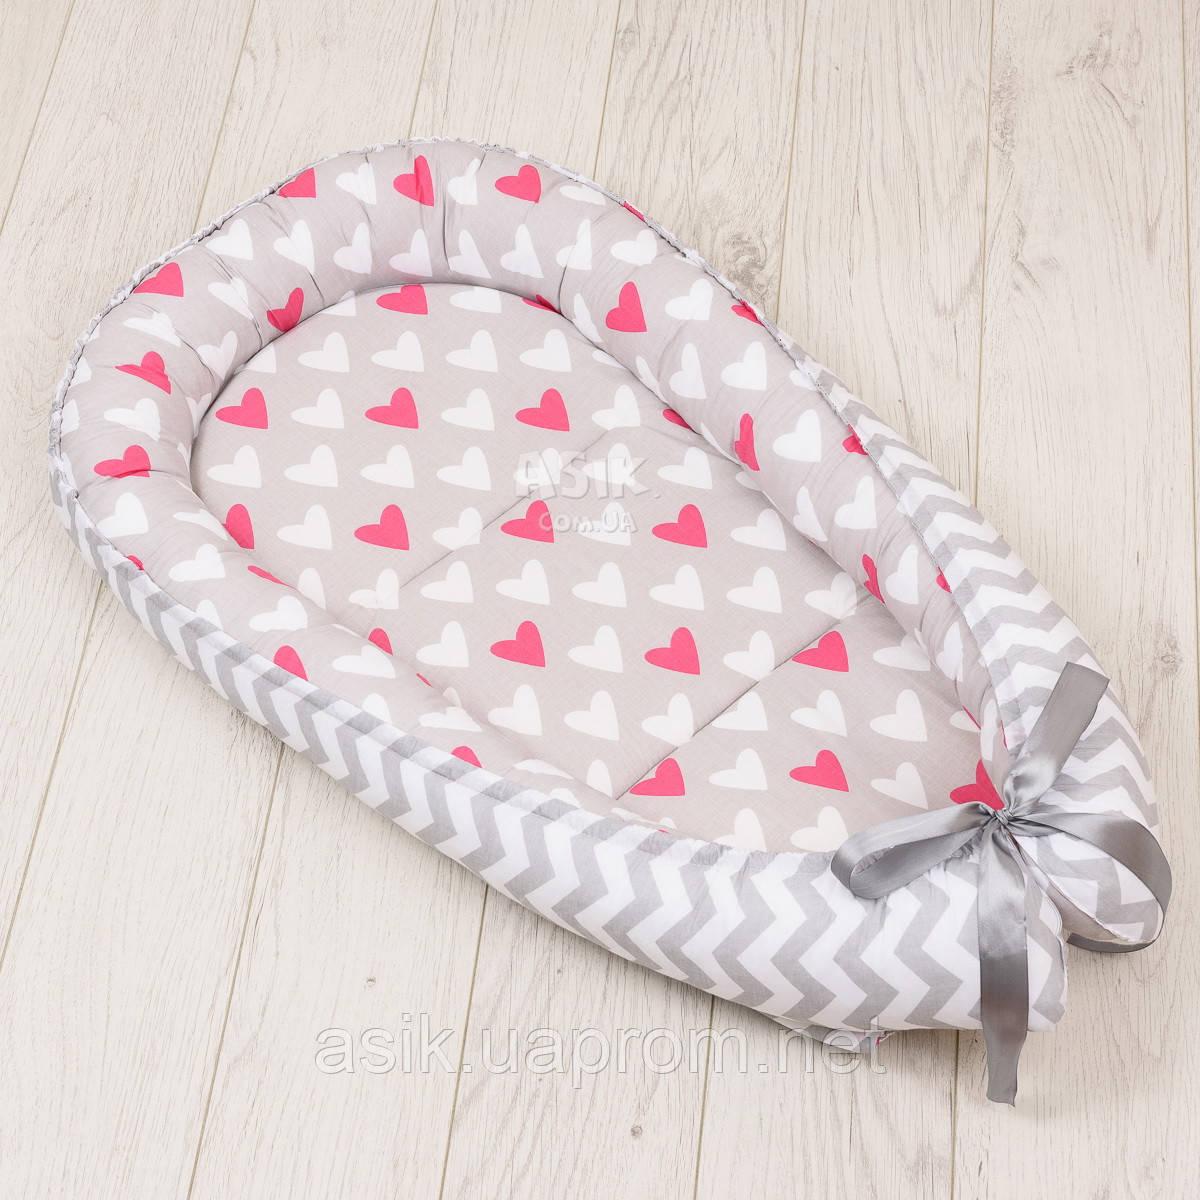 Кокон-гнёздышко для младенца Asik Амарантовые сердечки и серый зигзаг (КГ-7)